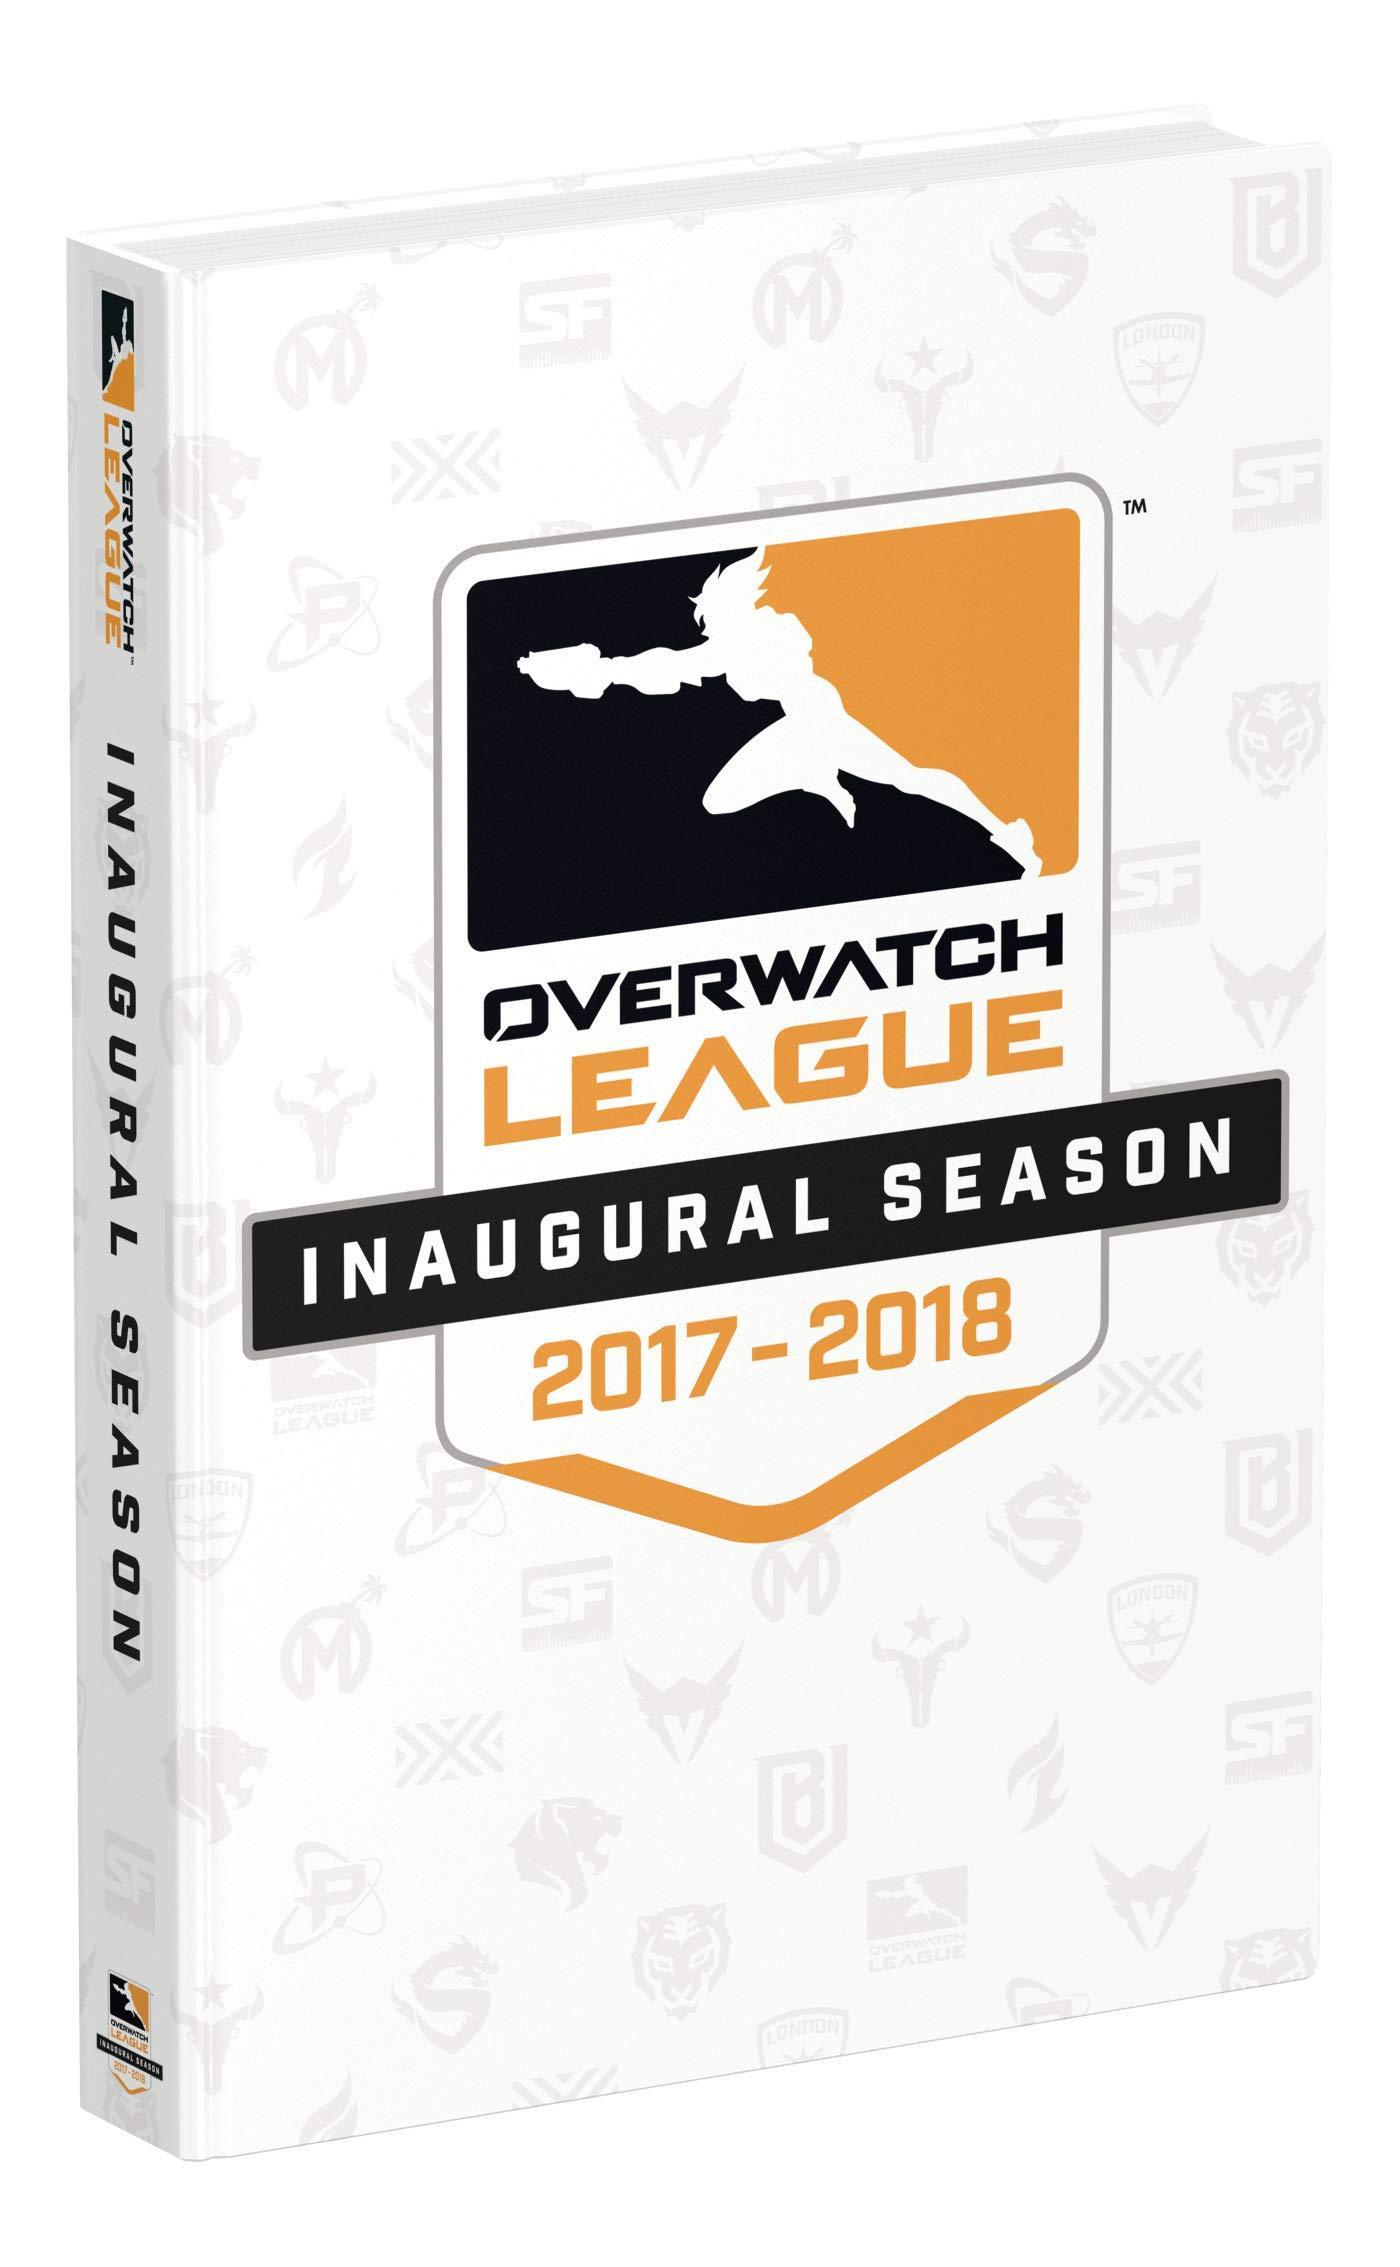 Prima/The Overwatch League